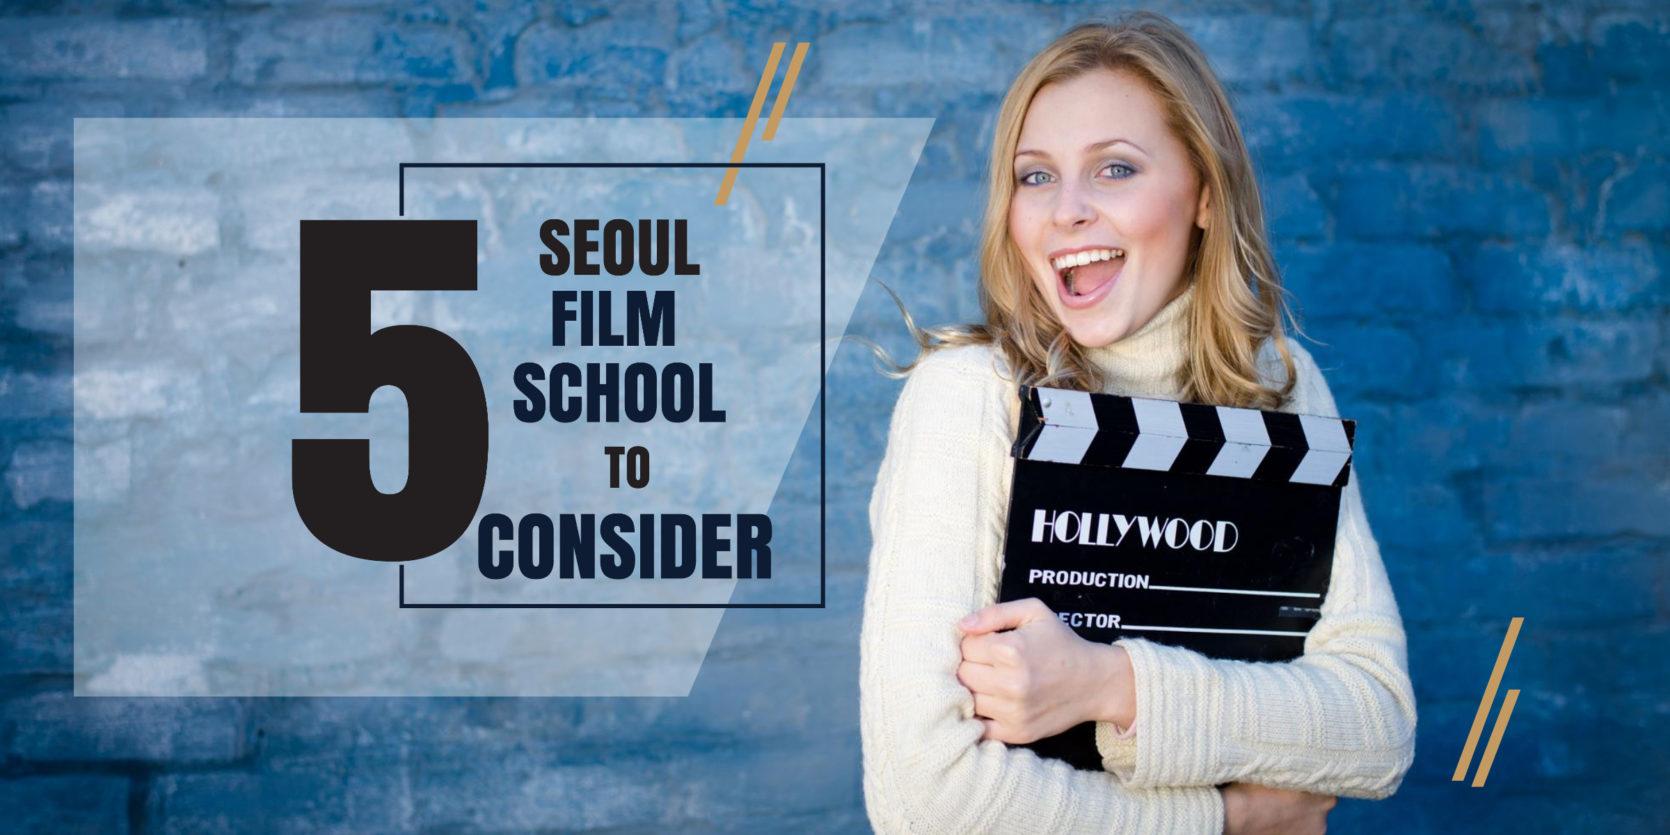 Top 5 Seoul Film Schools